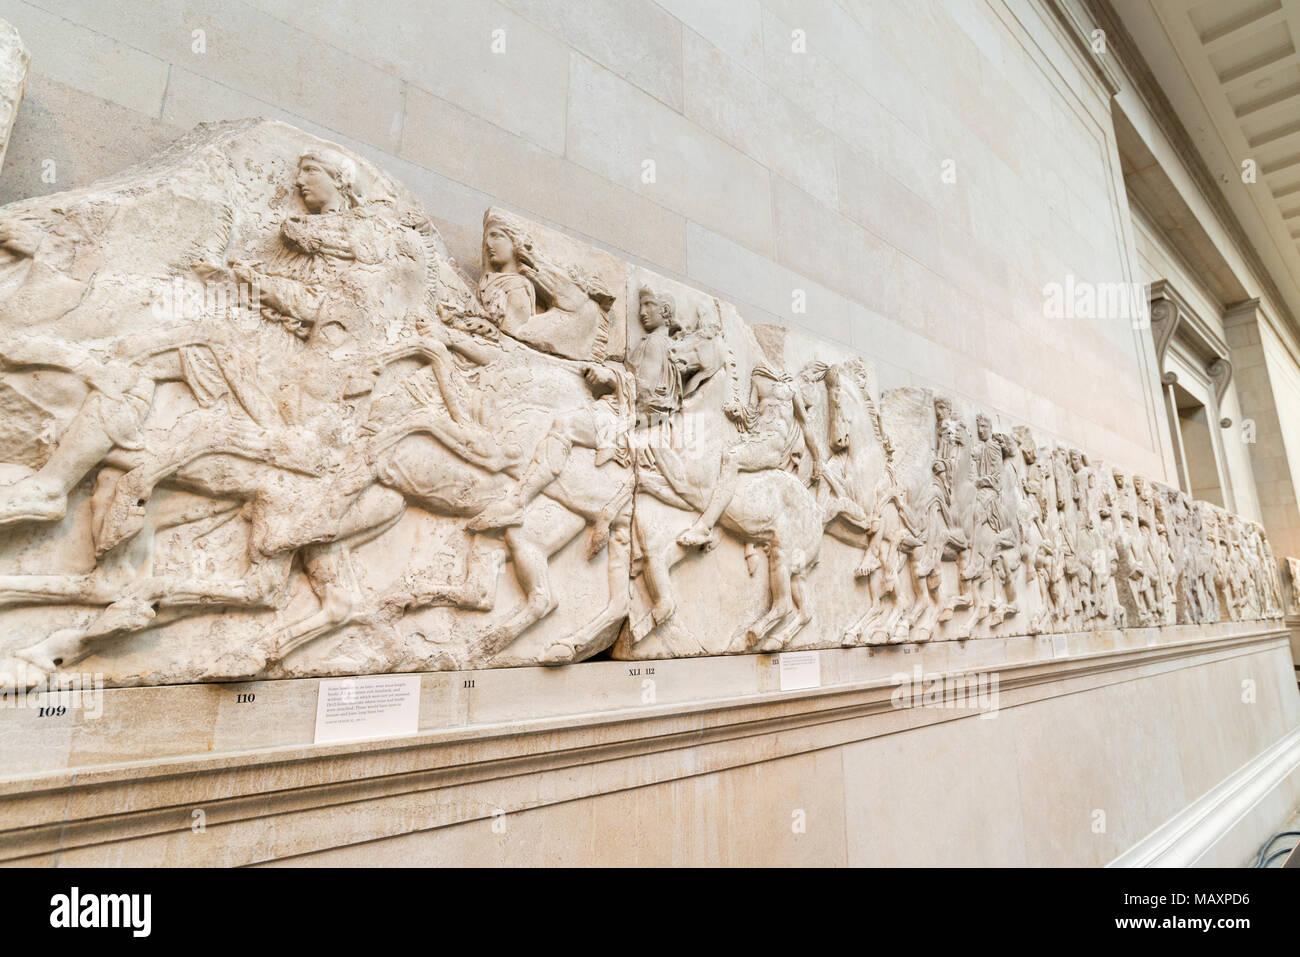 The Elgin marbles inside The British Museum, London, UK - Stock Image